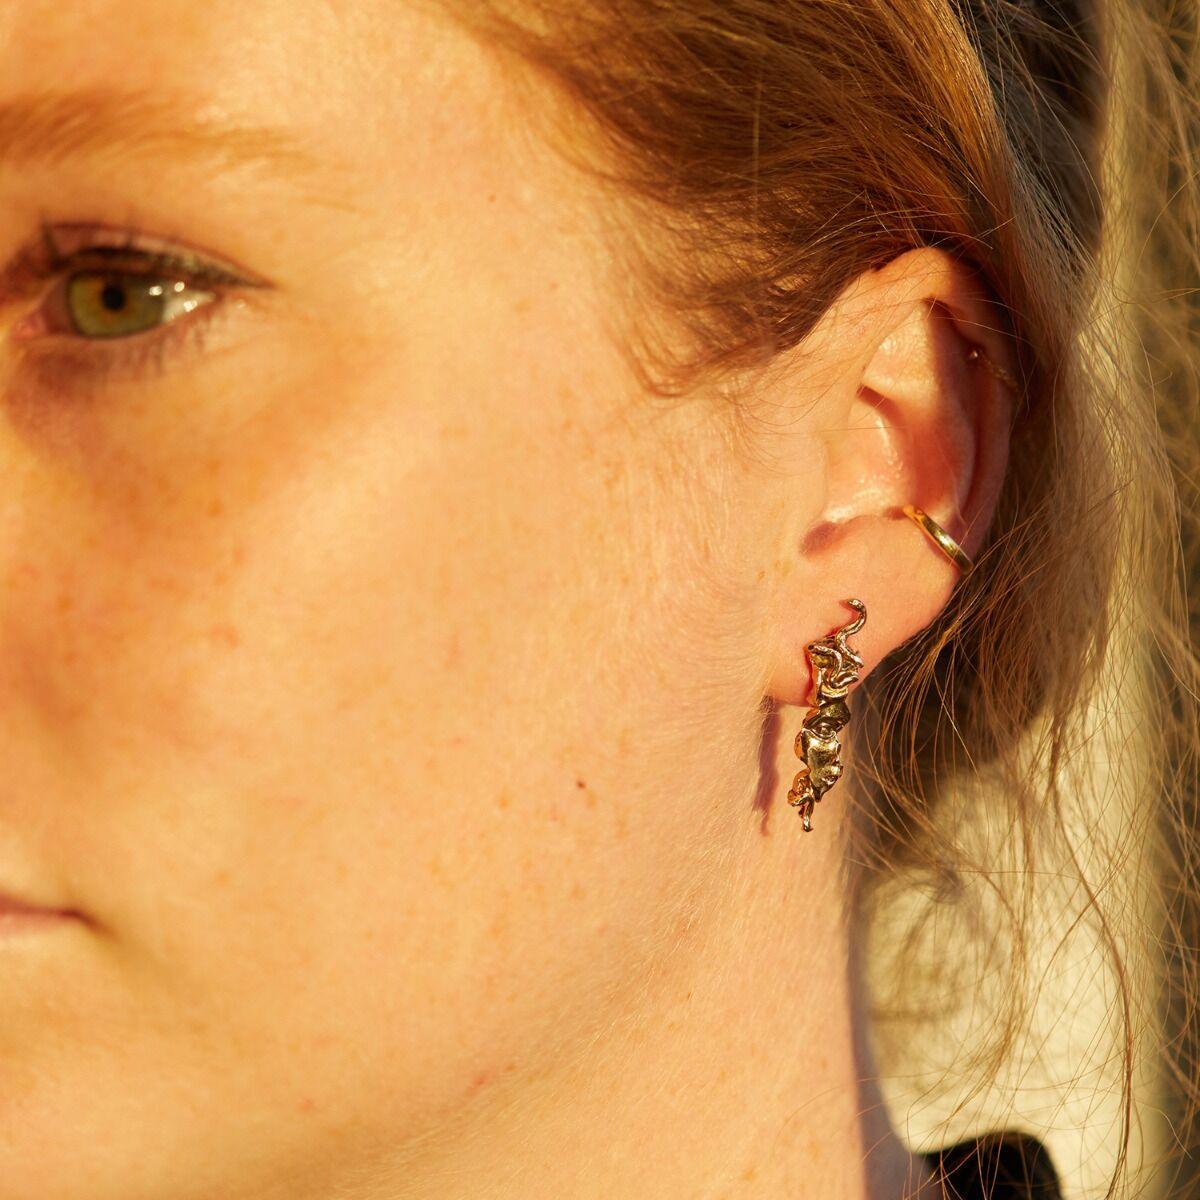 West Medusa Relic Earring (Single) image